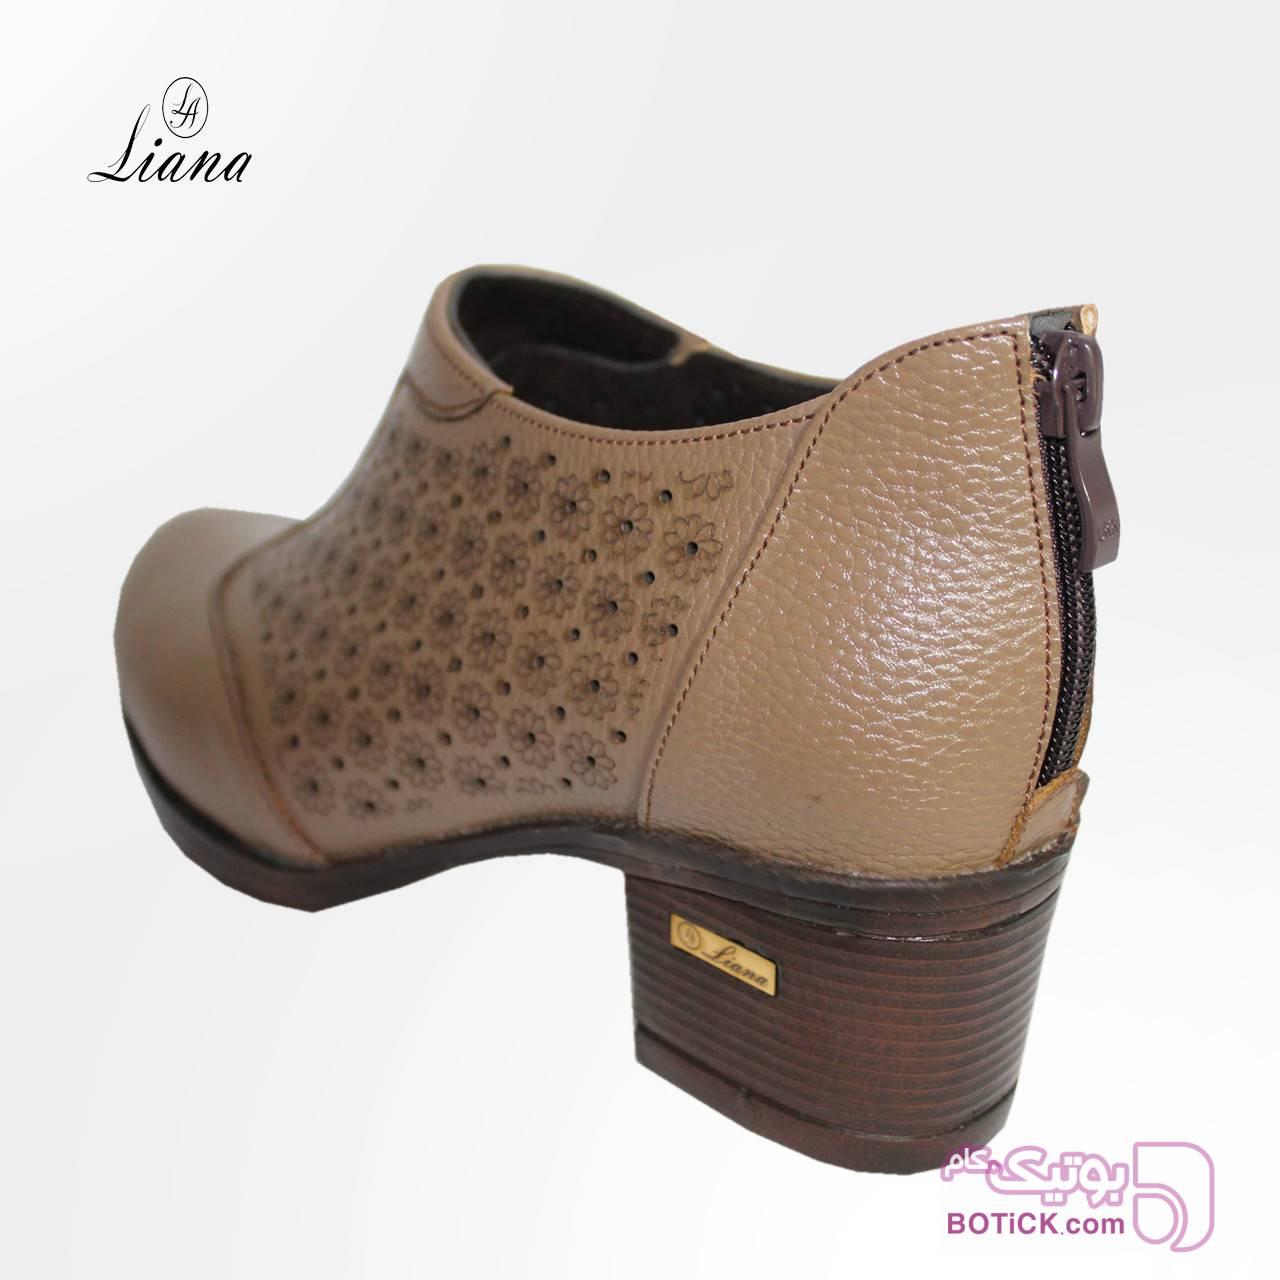 کفش لیانا کد292 مشکی كفش زنانه